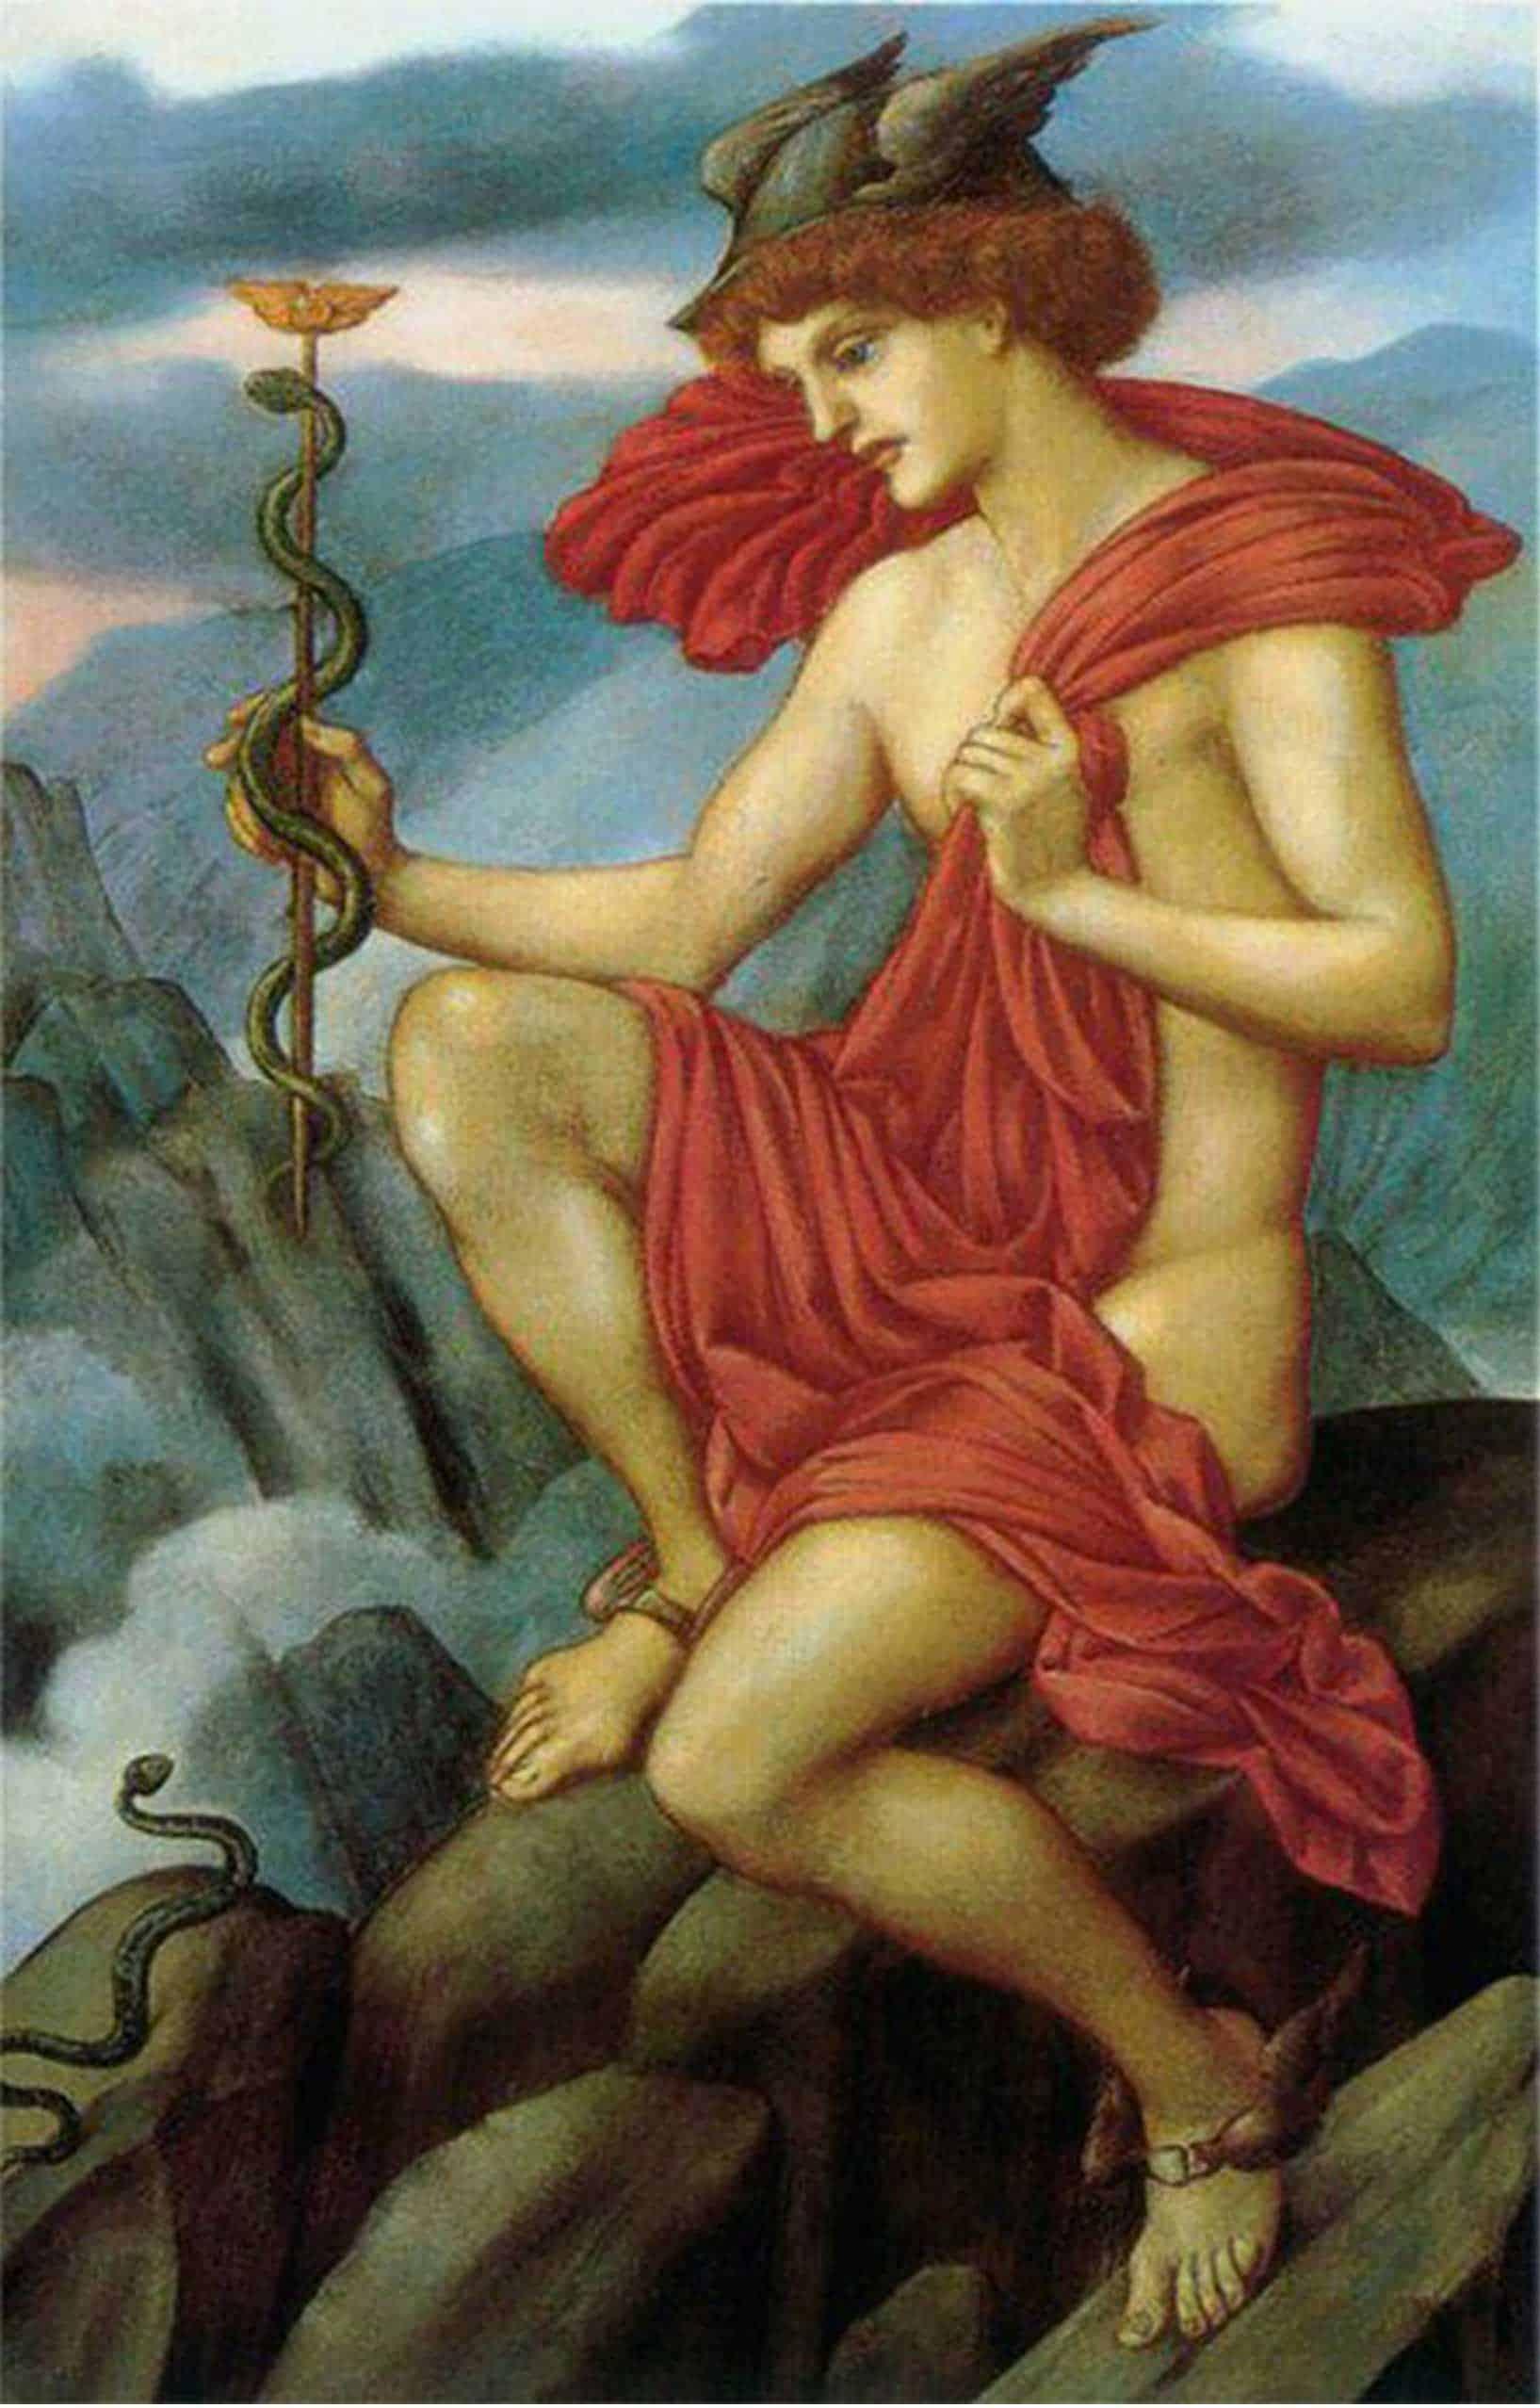 hermes-painting-pascoe-vale-gnostic-centre